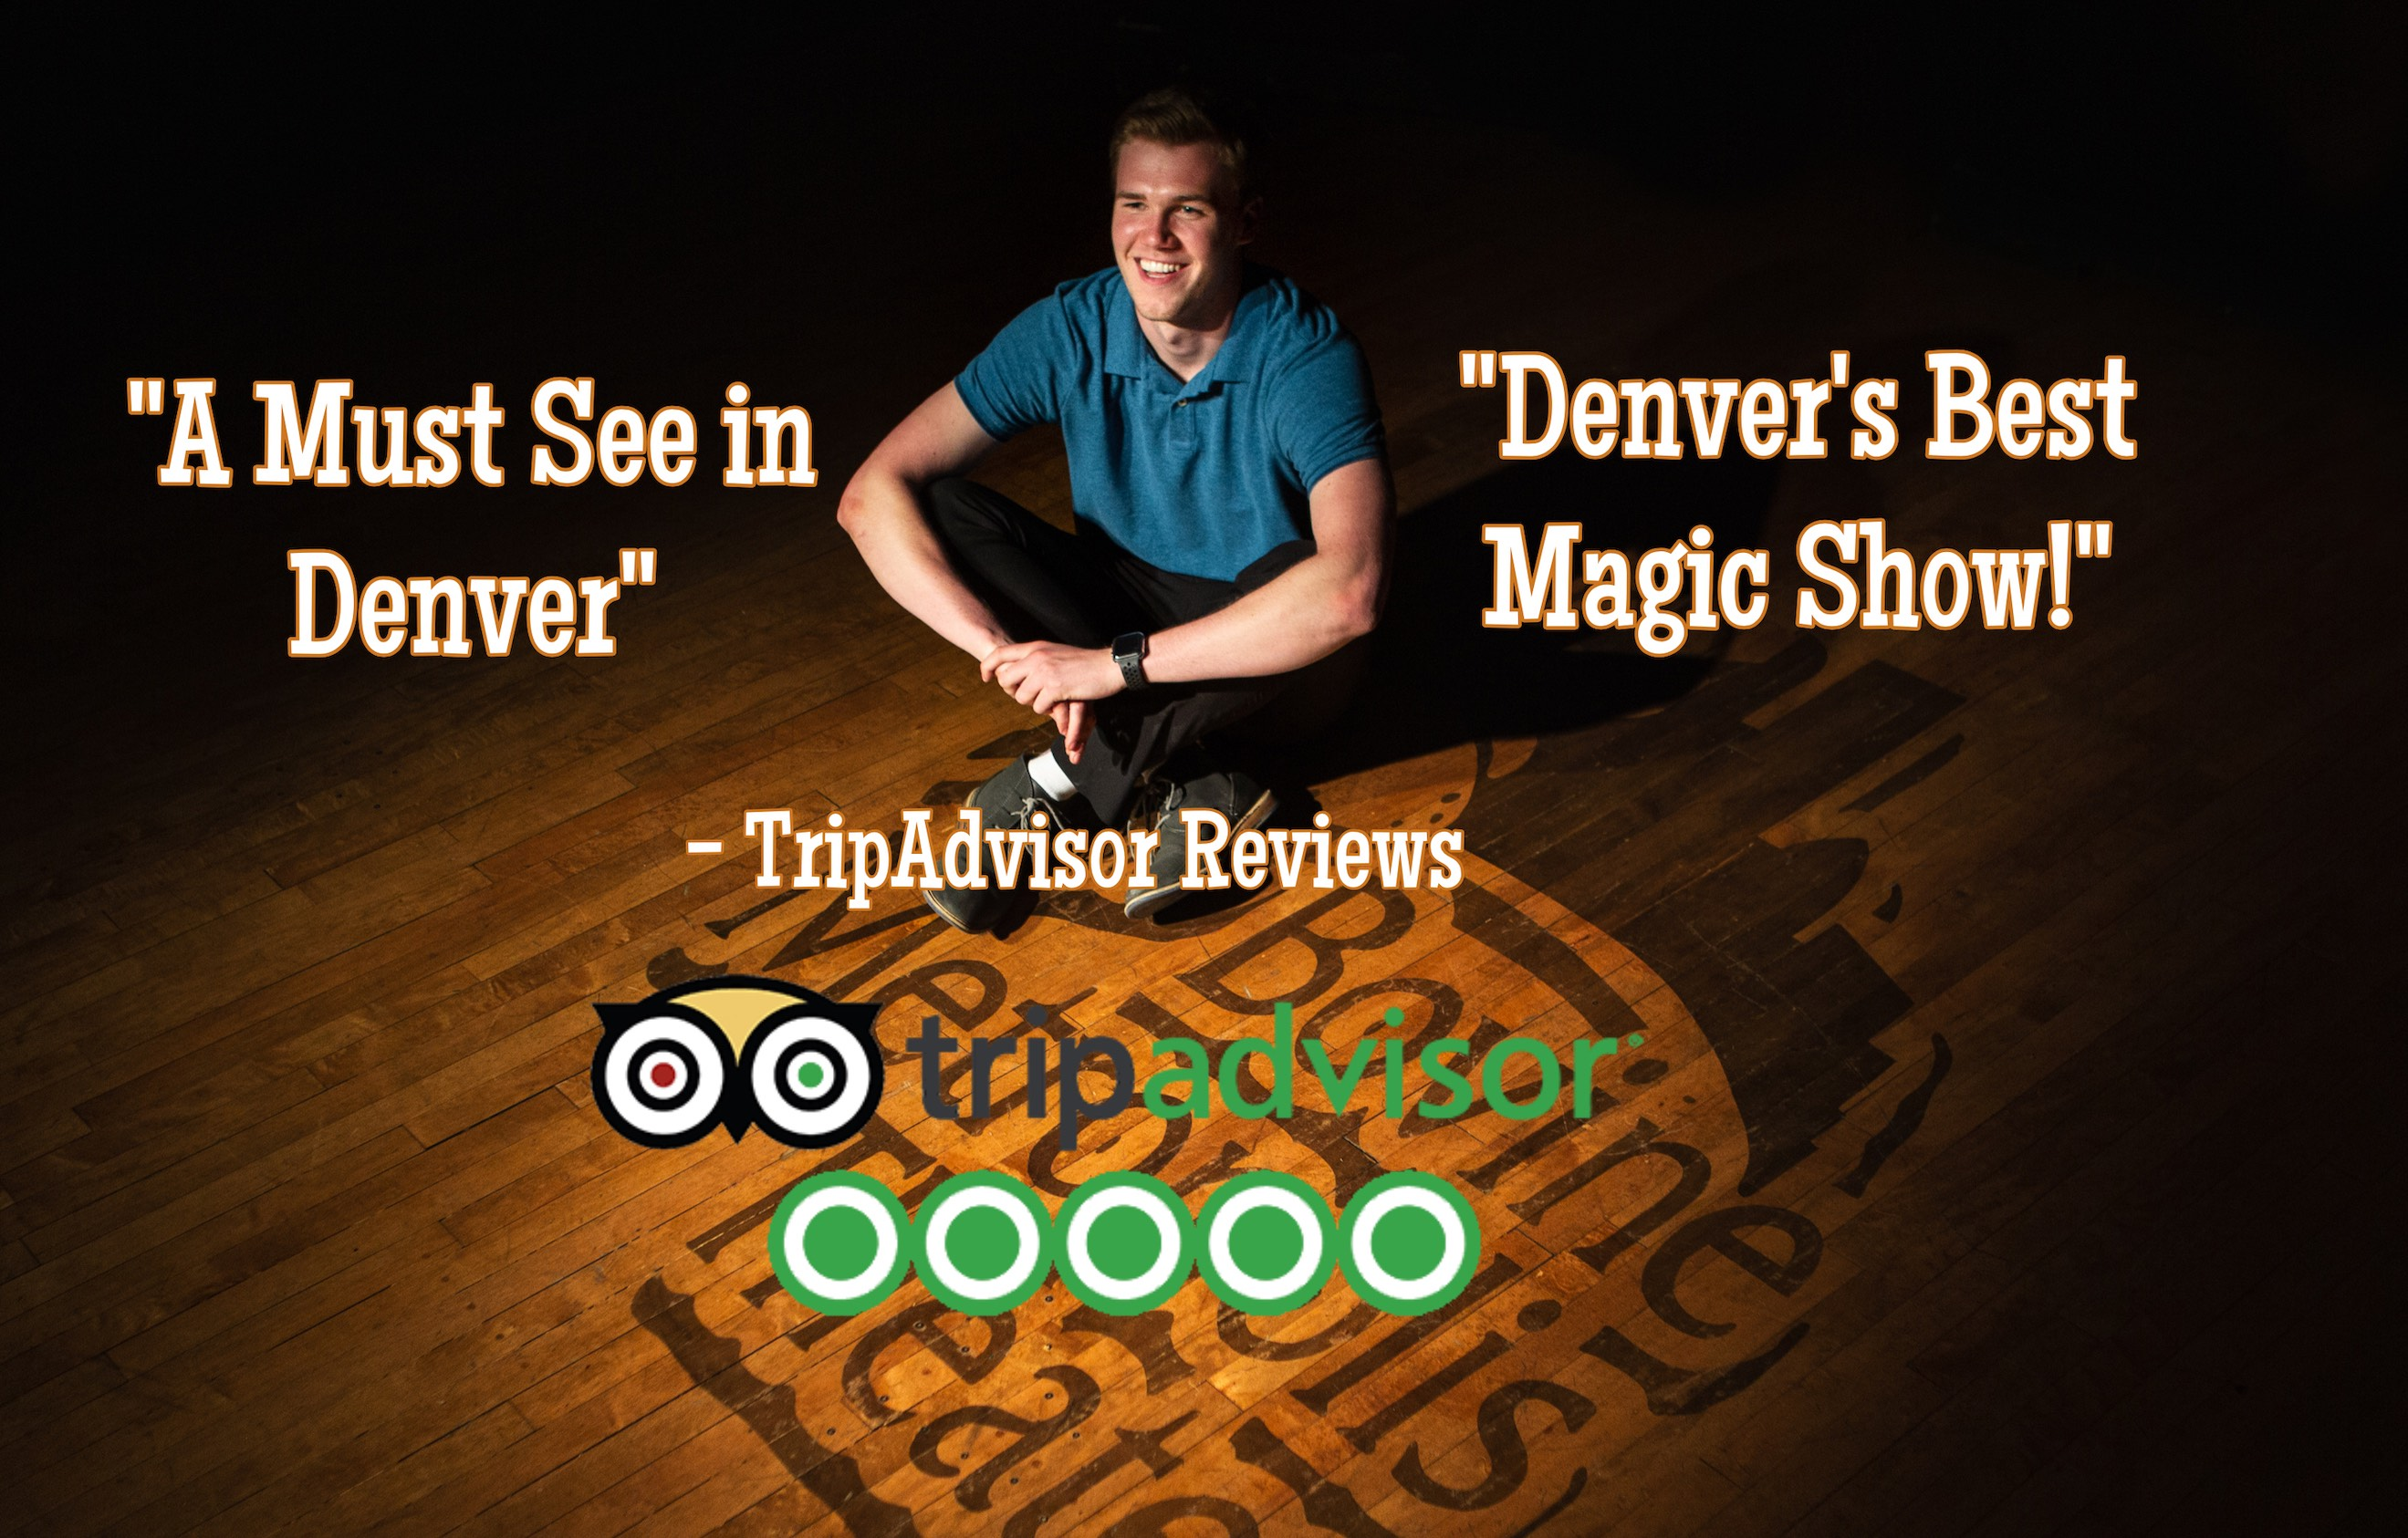 Denver's Best Magic Show